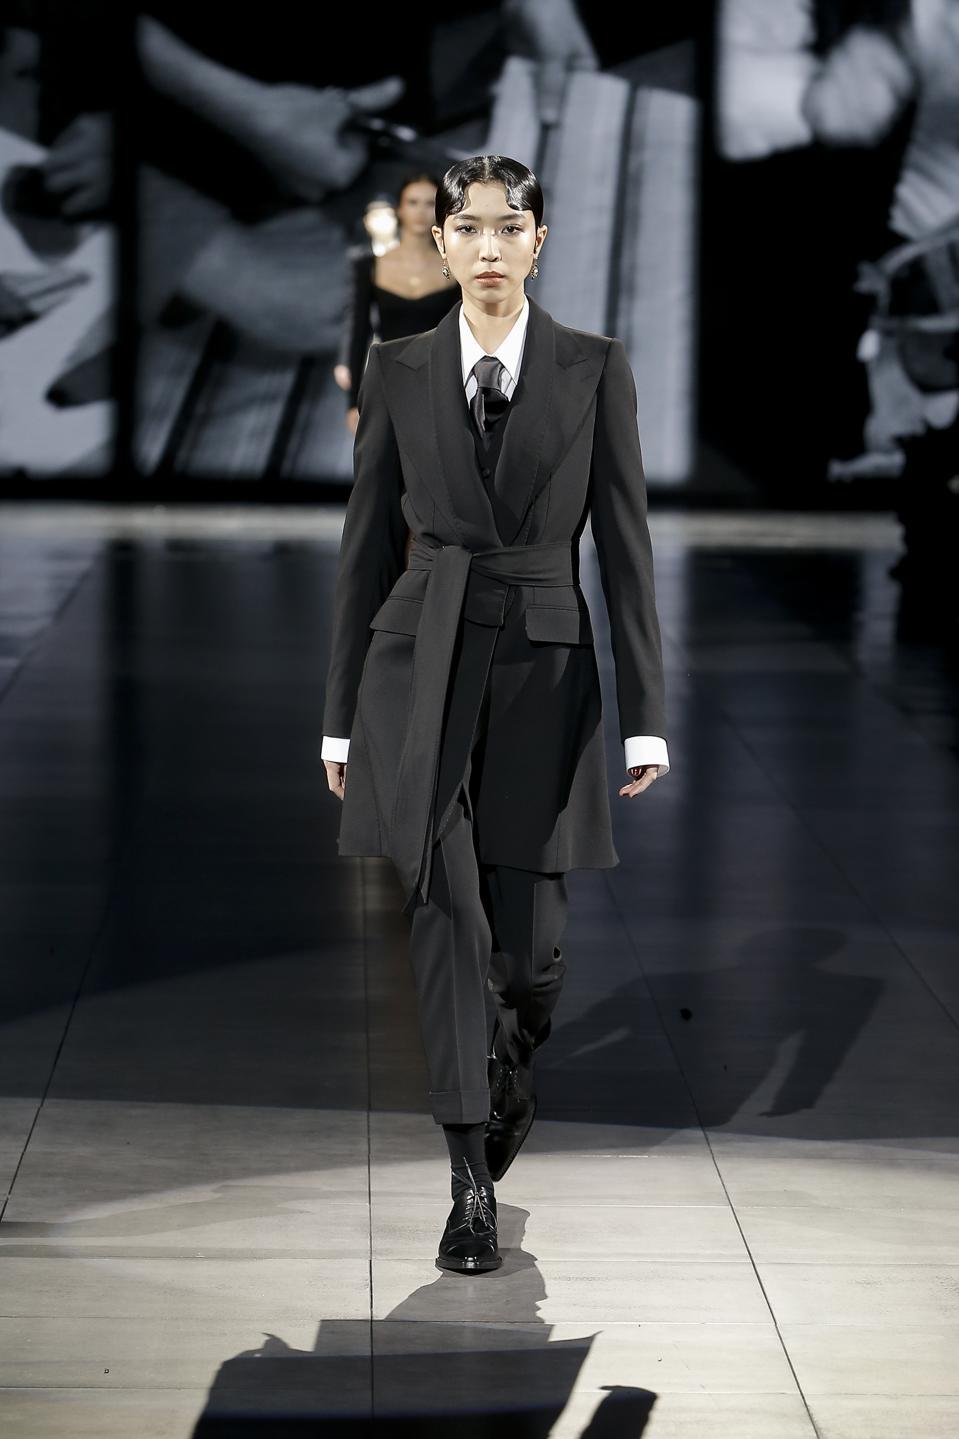 Dolce&Gabbana Fall/Winter 2020 runway look